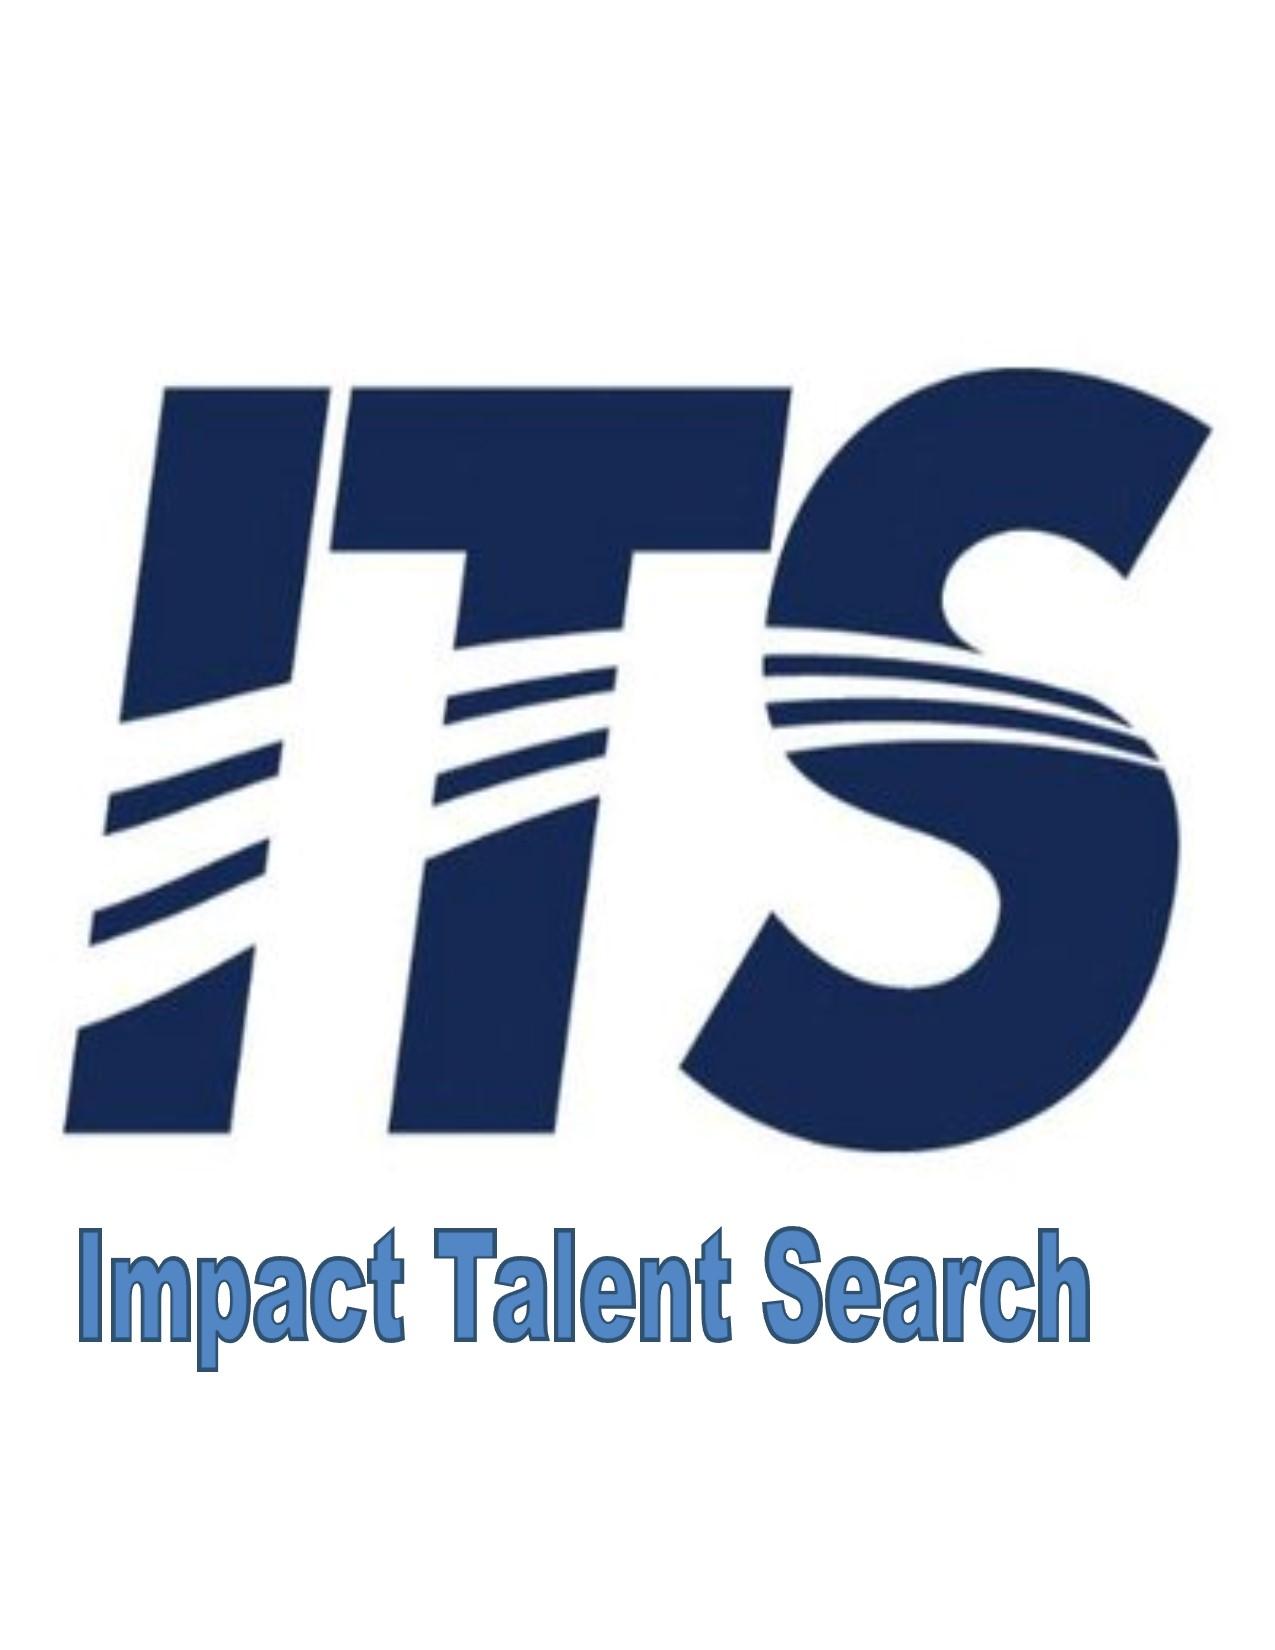 impact-talent-search-logo-image